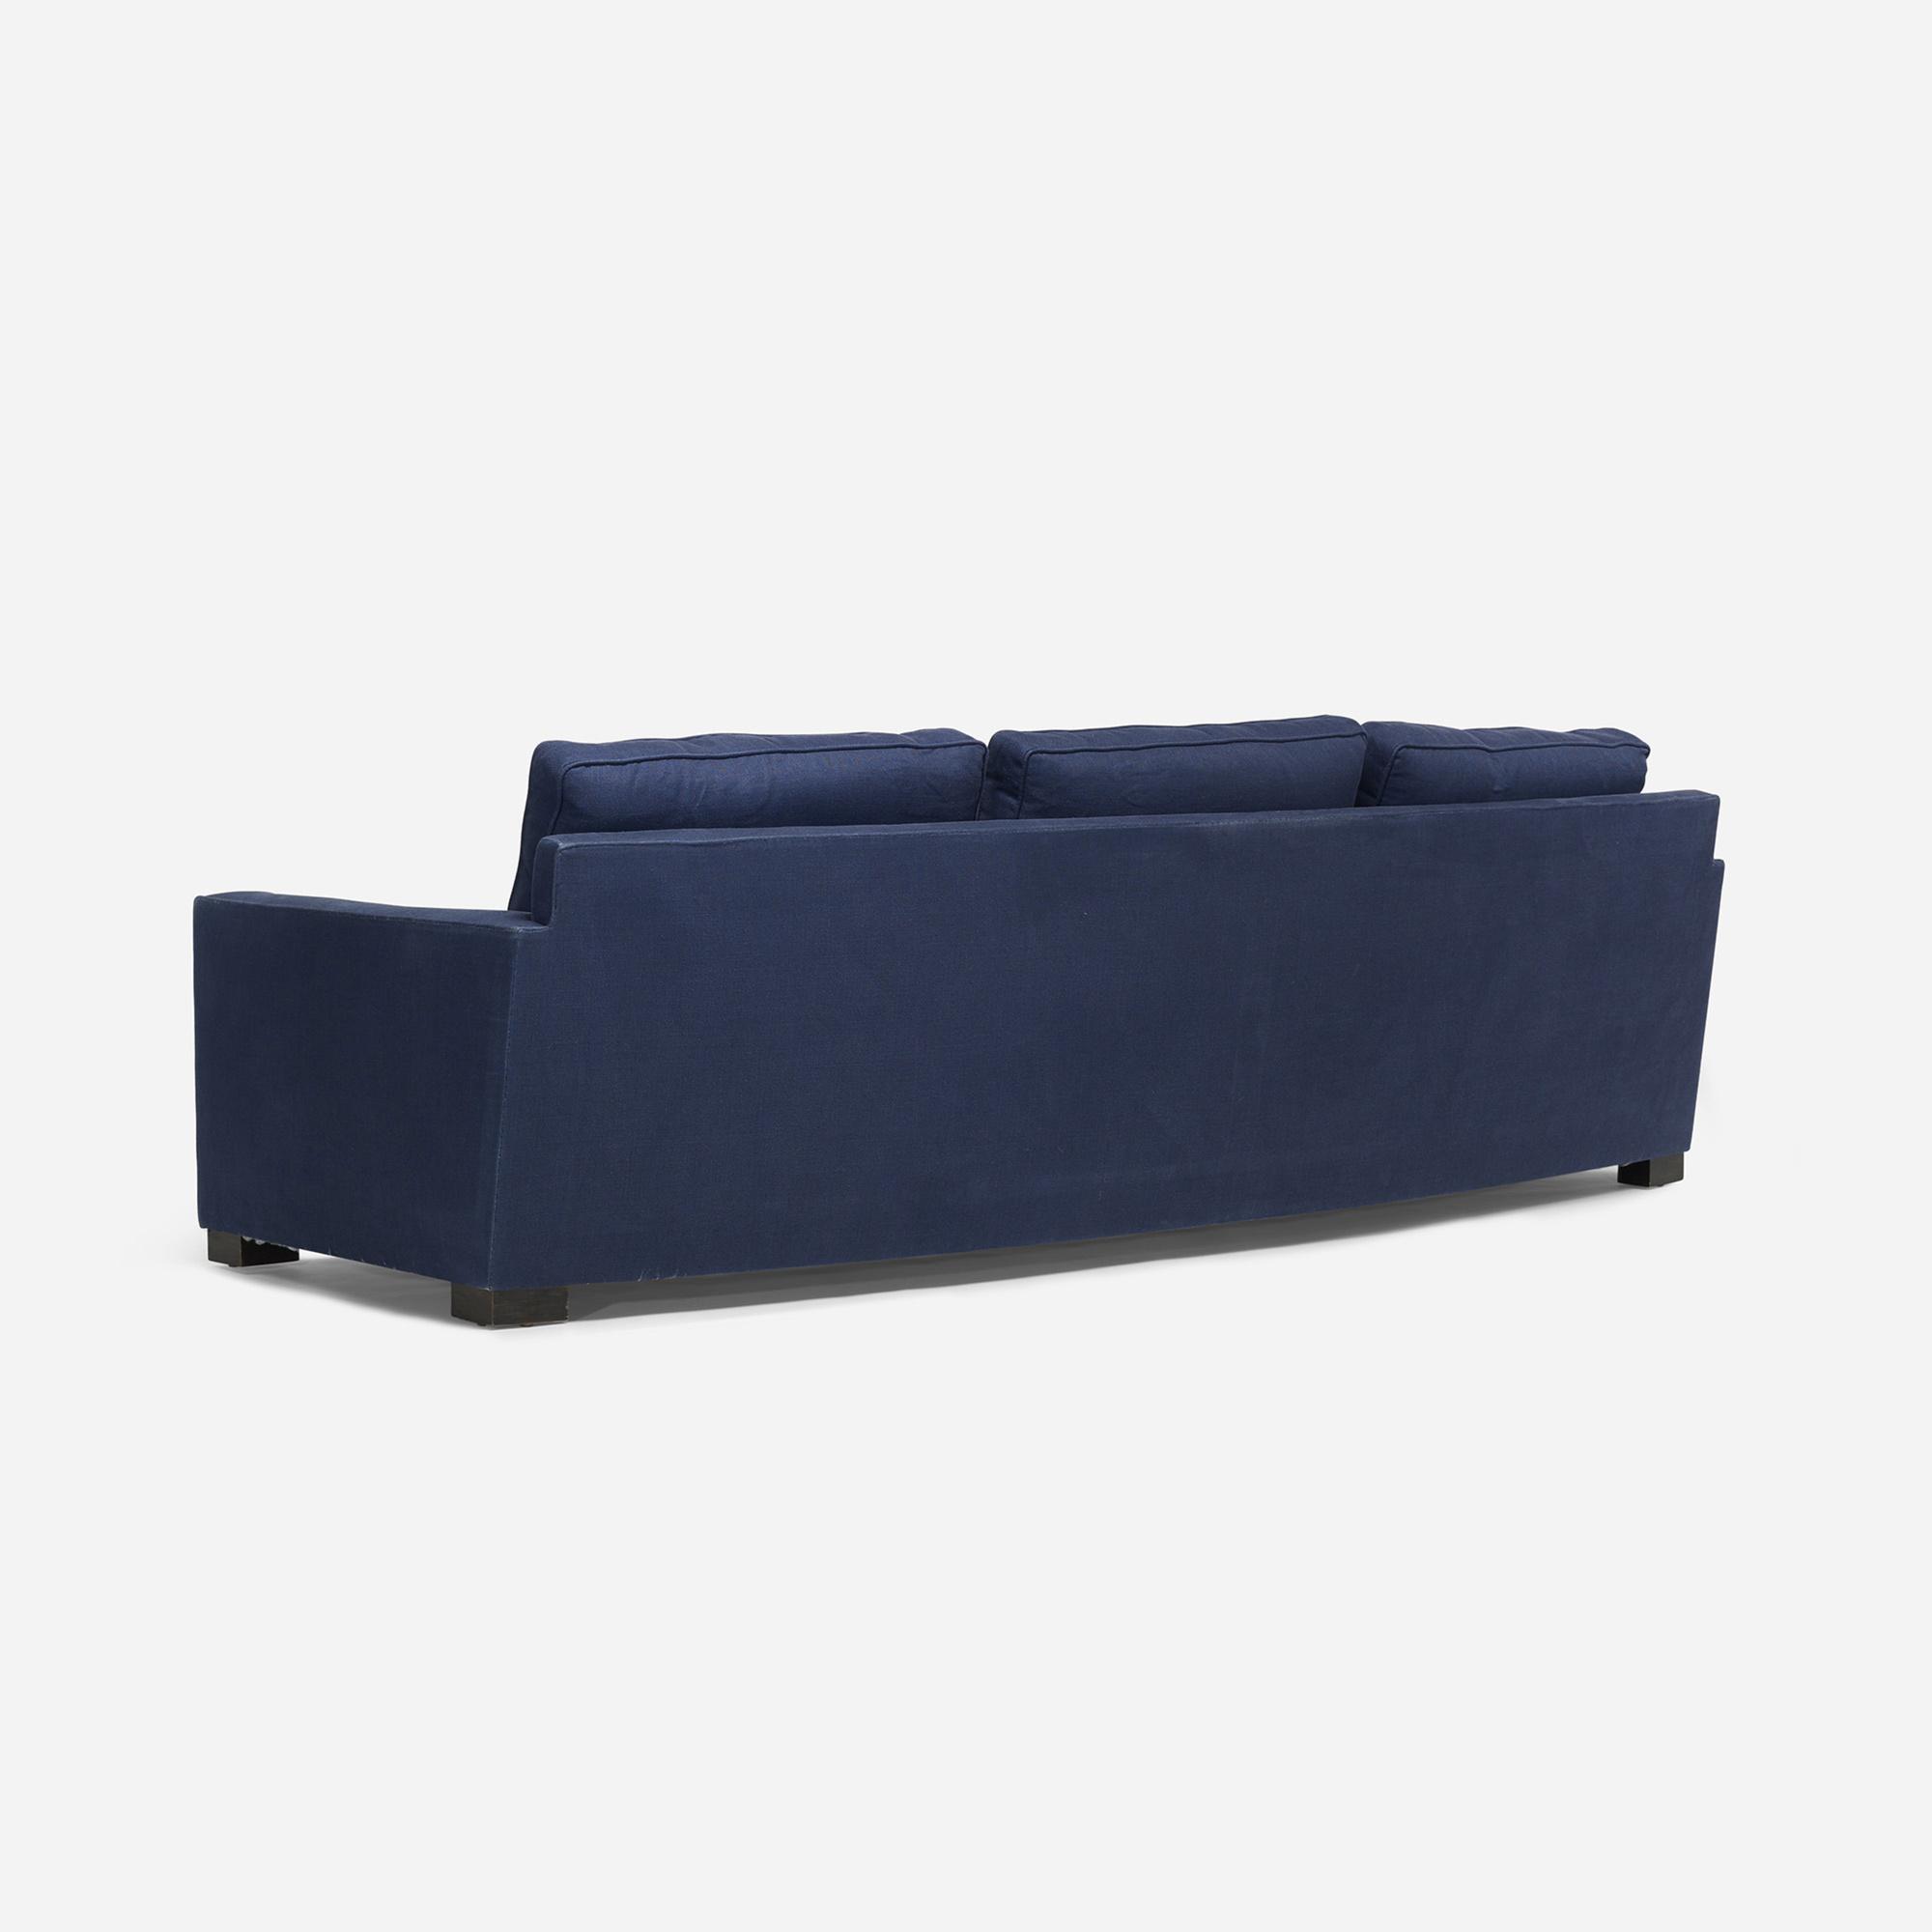 577: Modern / sofa (3 of 3)